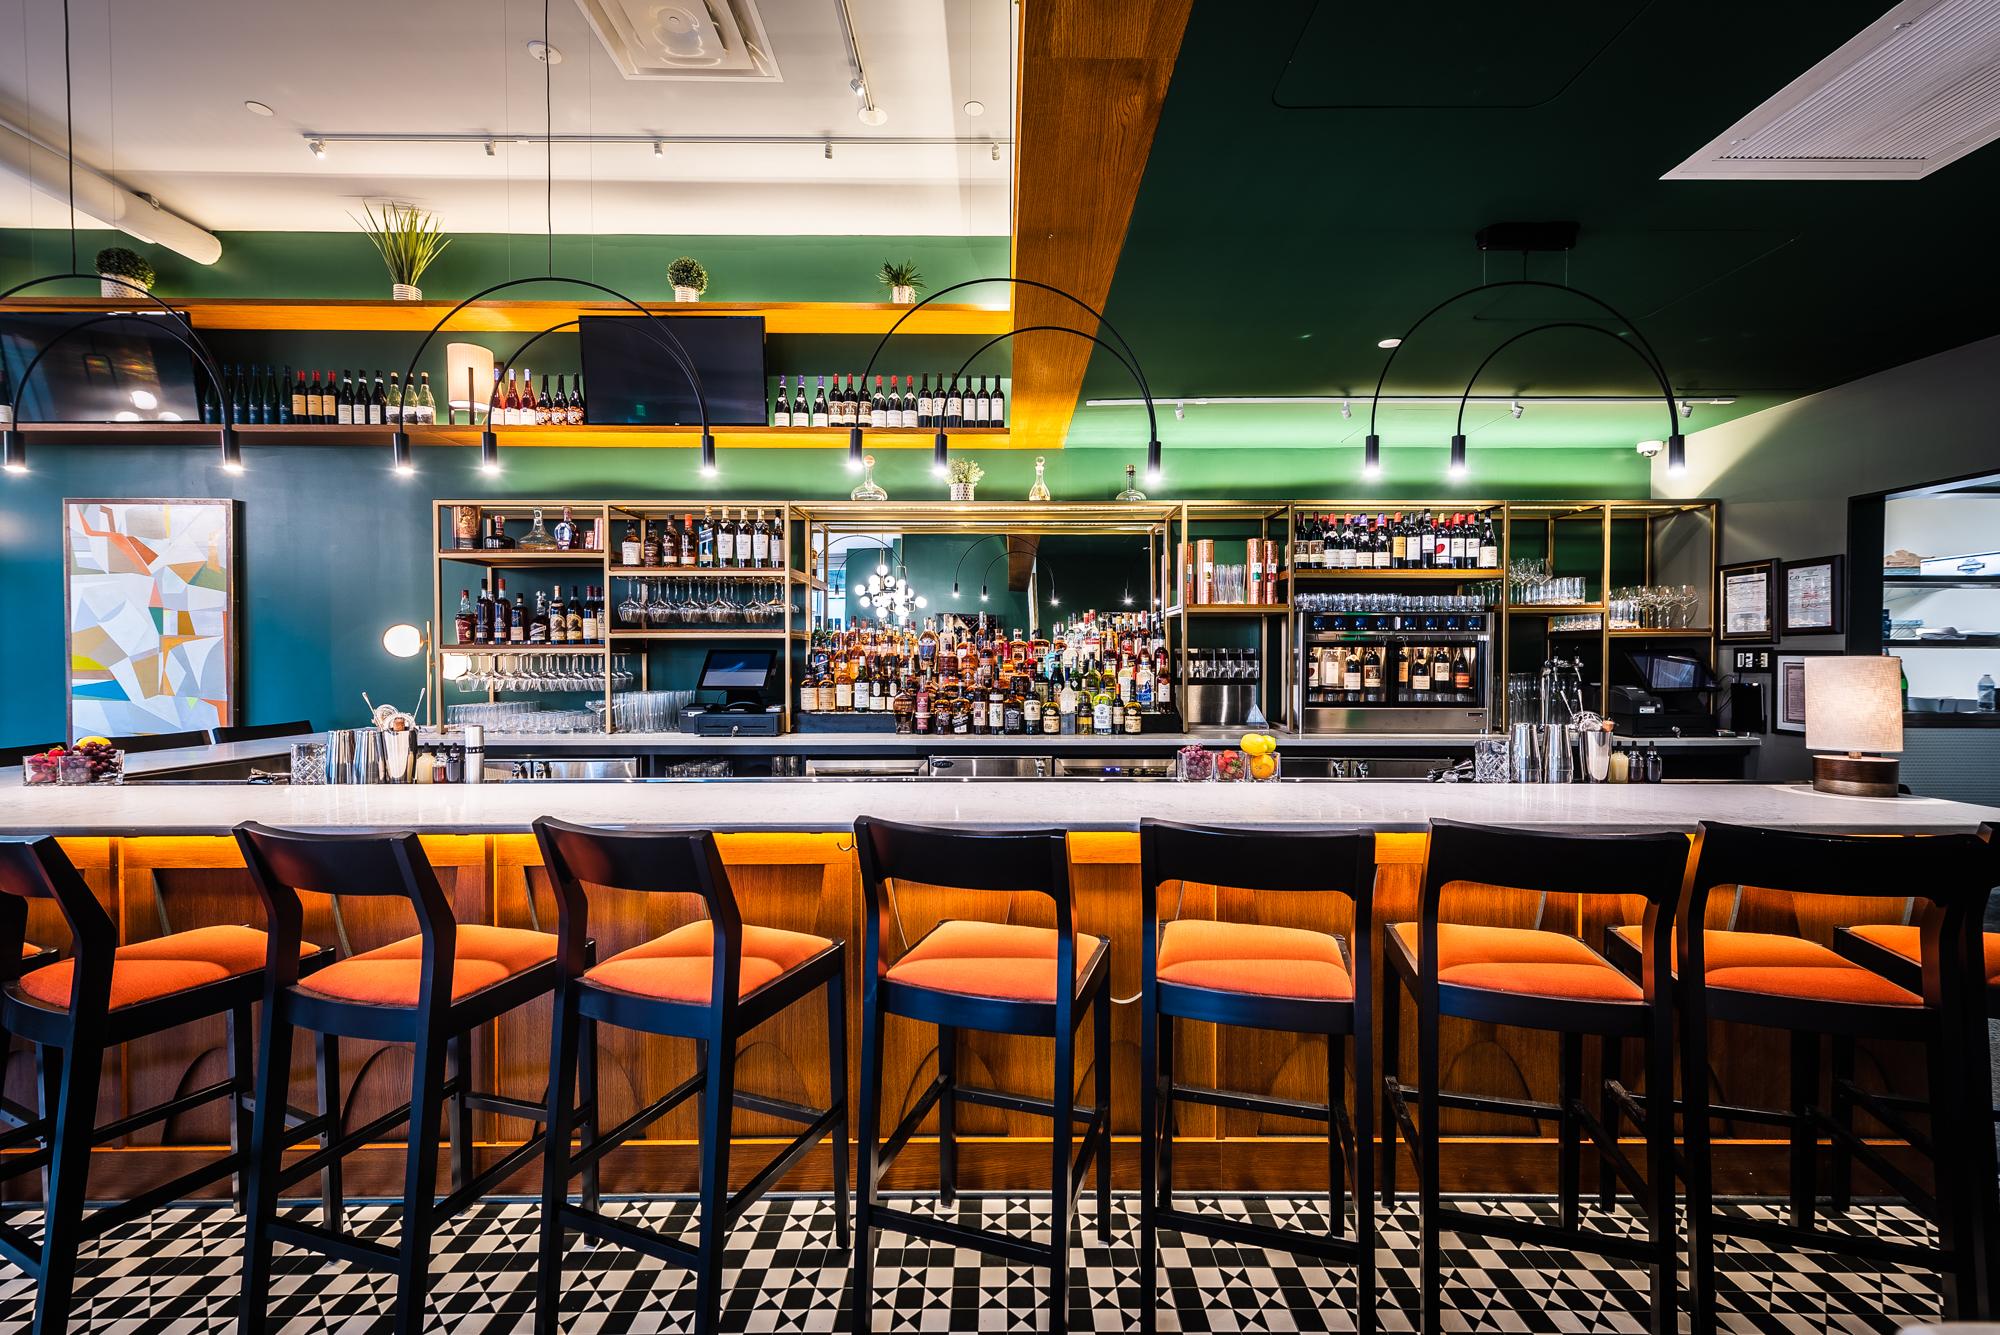 The bar inside the Eastern has a Mid-century Modern style